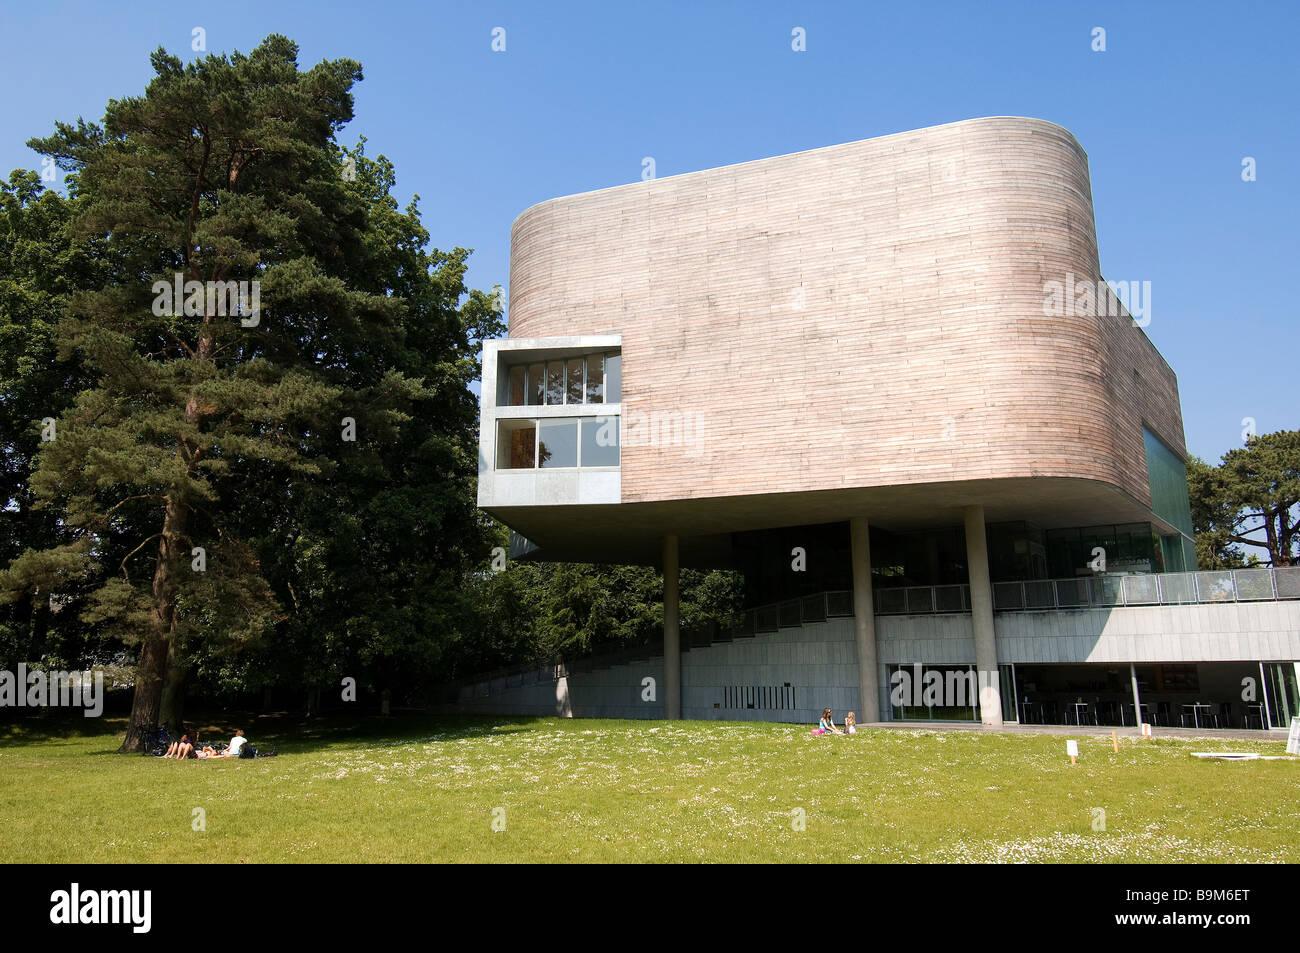 ireland  county cork  cork  university college cork  ucc   the lewis stock photo  royalty free